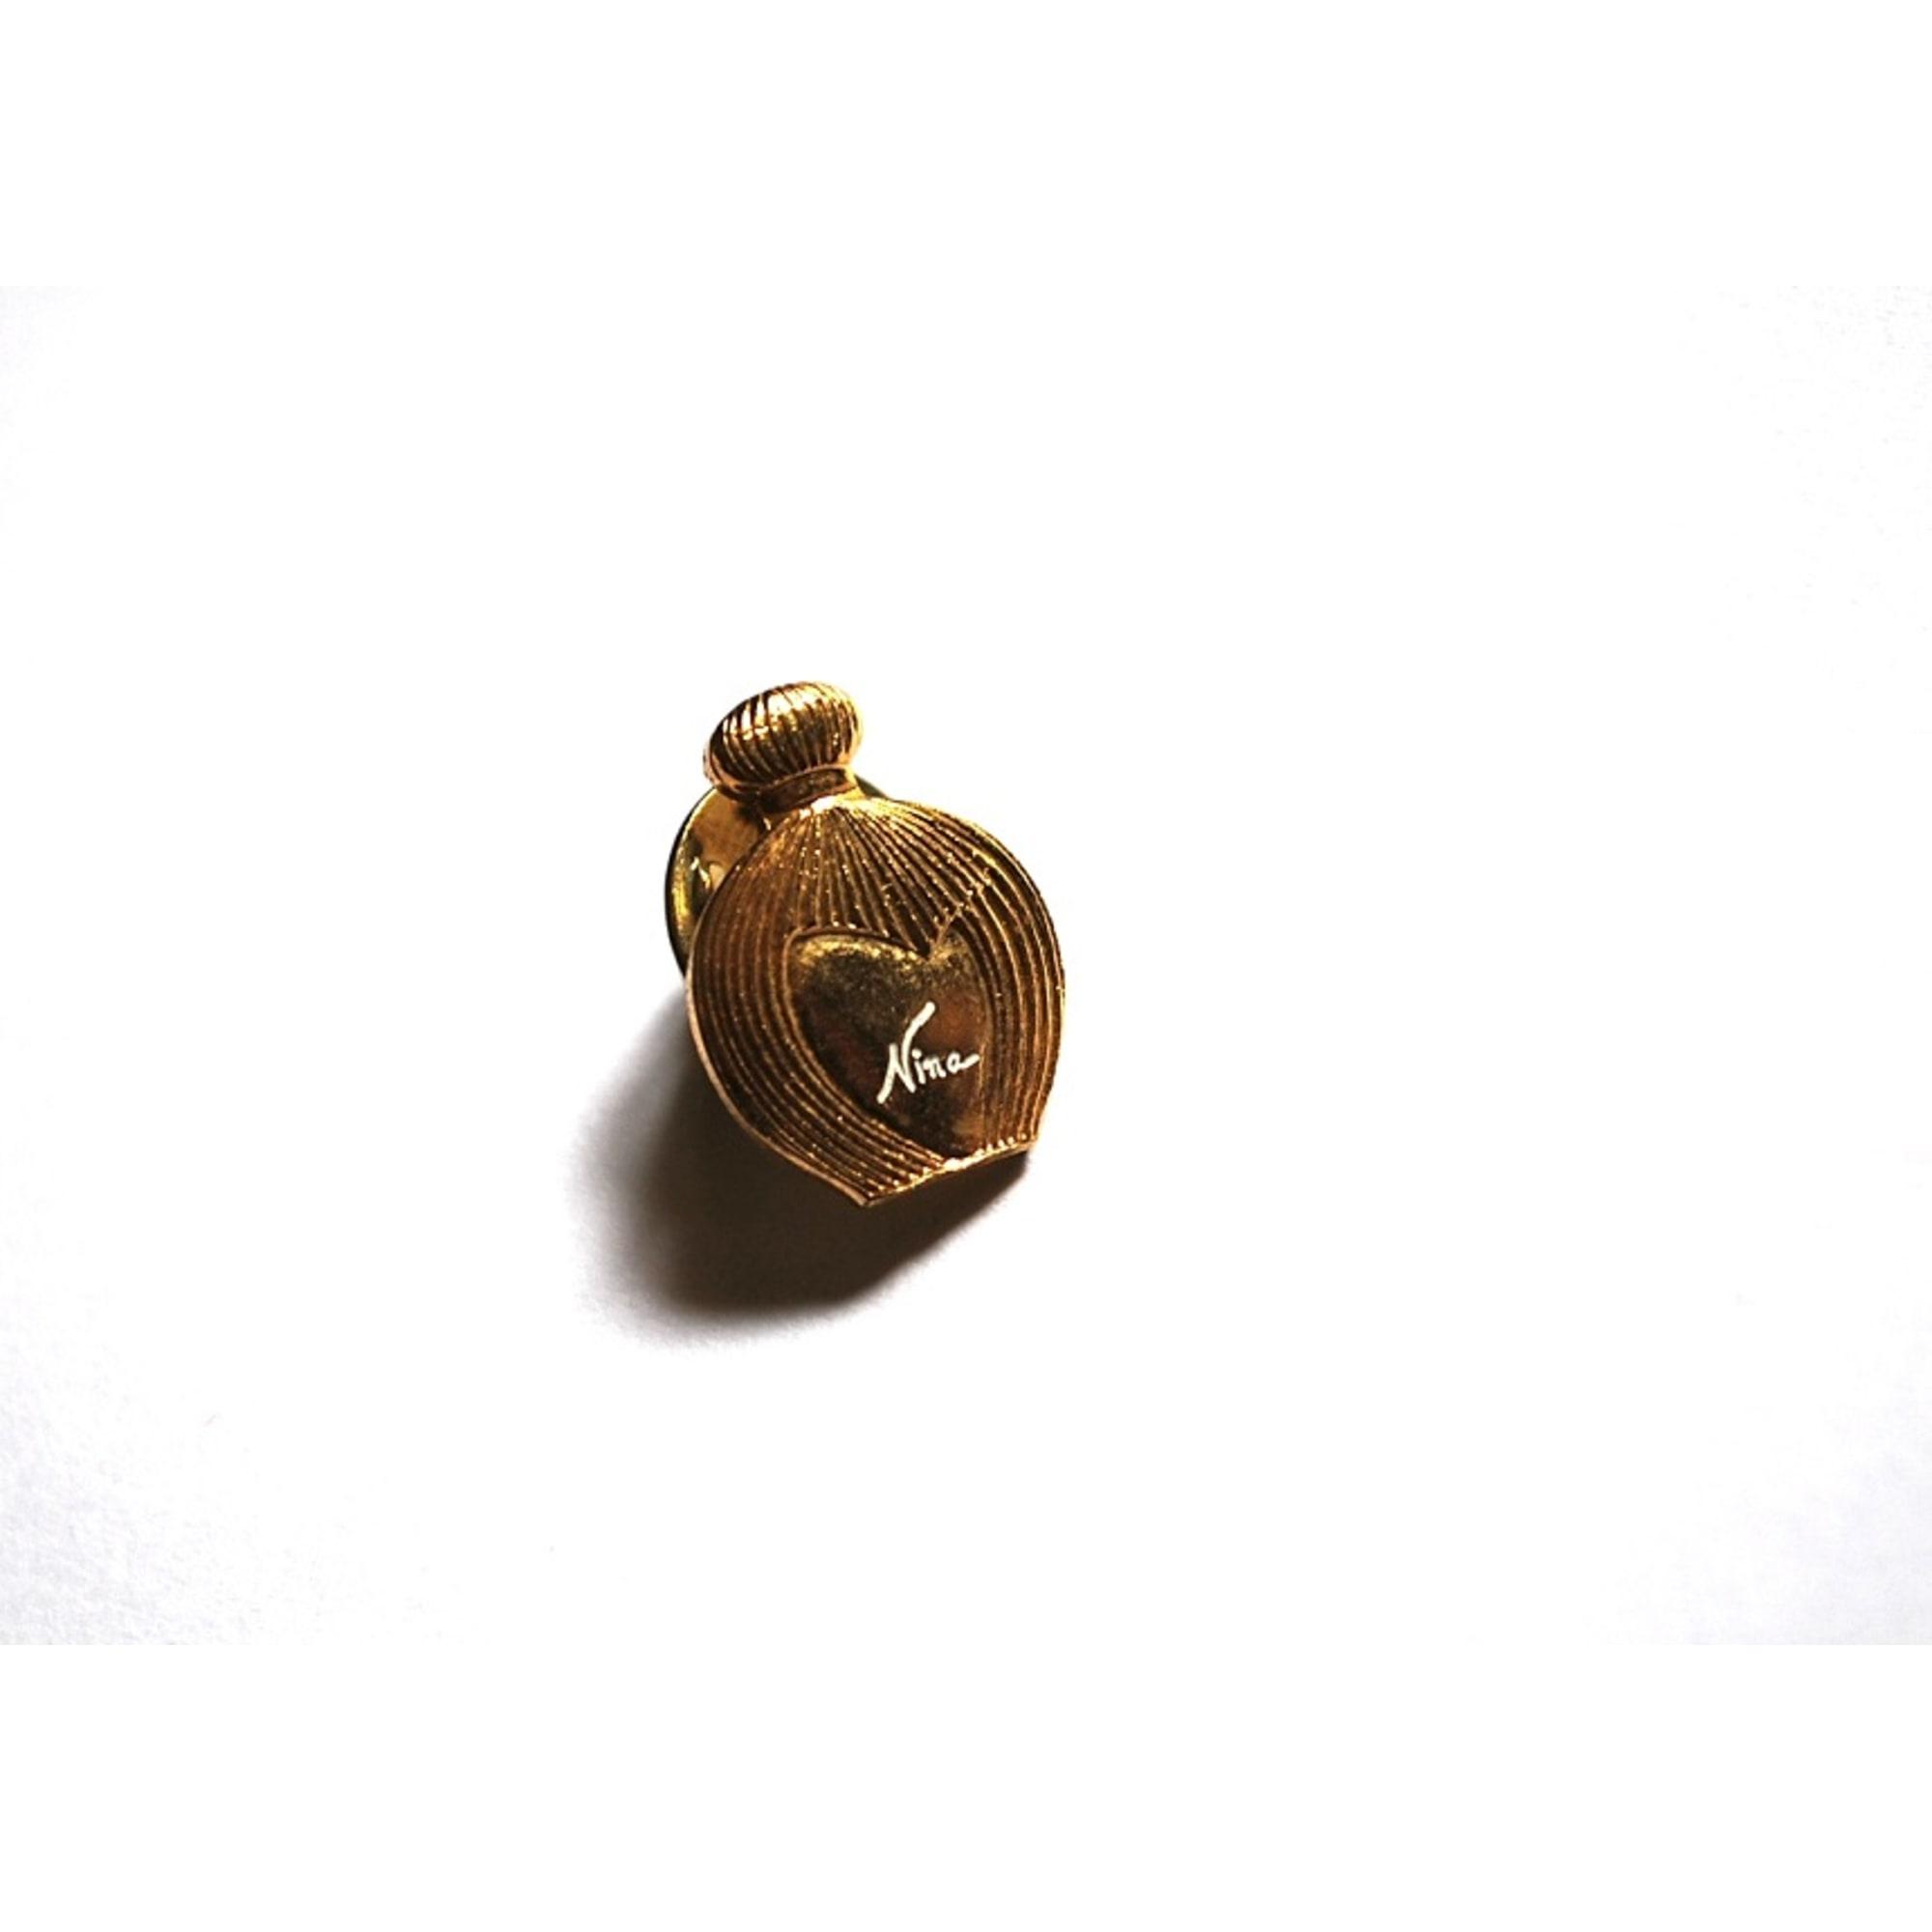 Pin's NINA RICCI Doré, bronze, cuivre